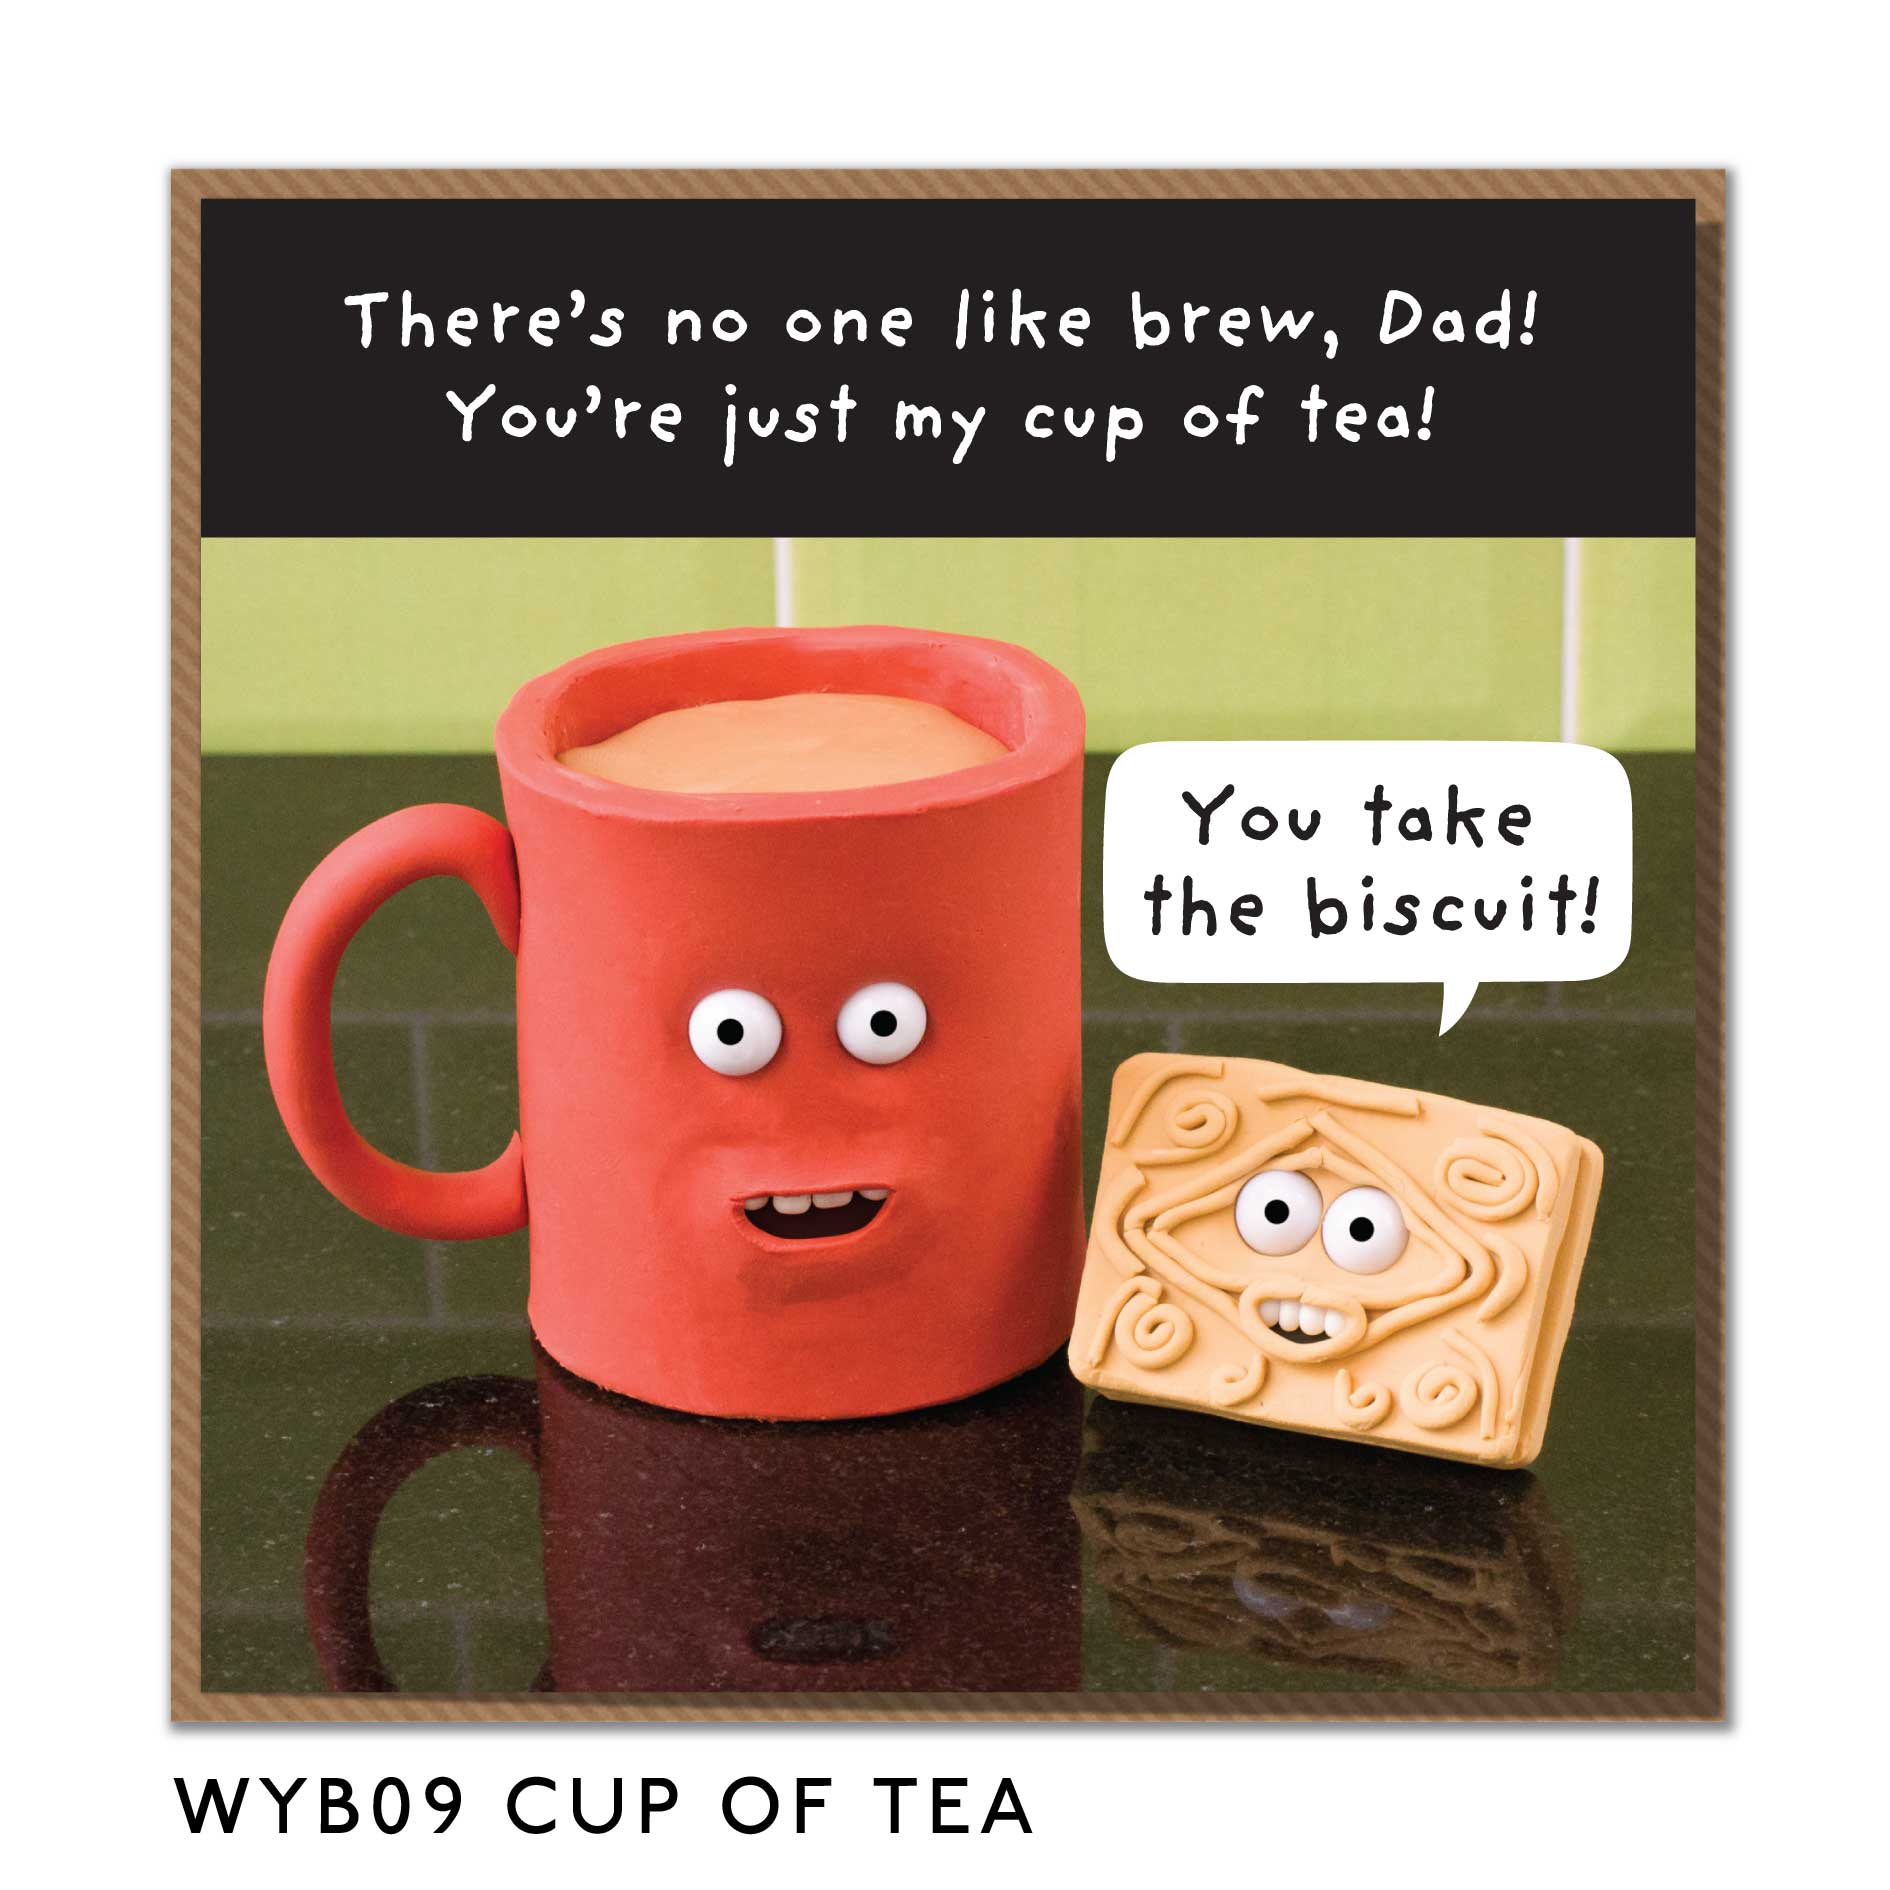 WYB09-CUP-OF-TEA.jpg